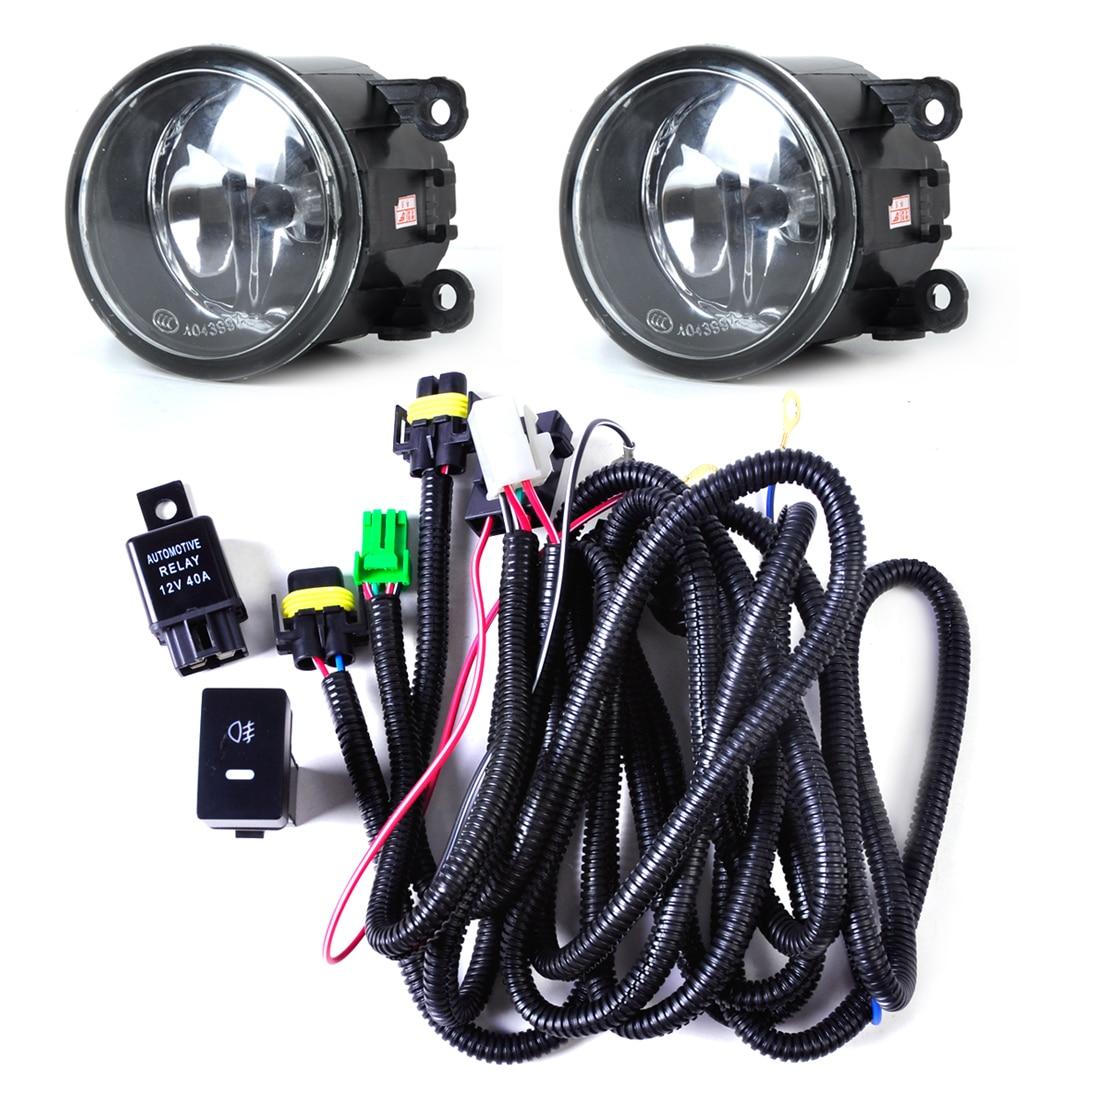 dwcx black wiring harness sockets switch 2 fog lights miata fog light wiring diagram 12v fog light wiring diagram #2